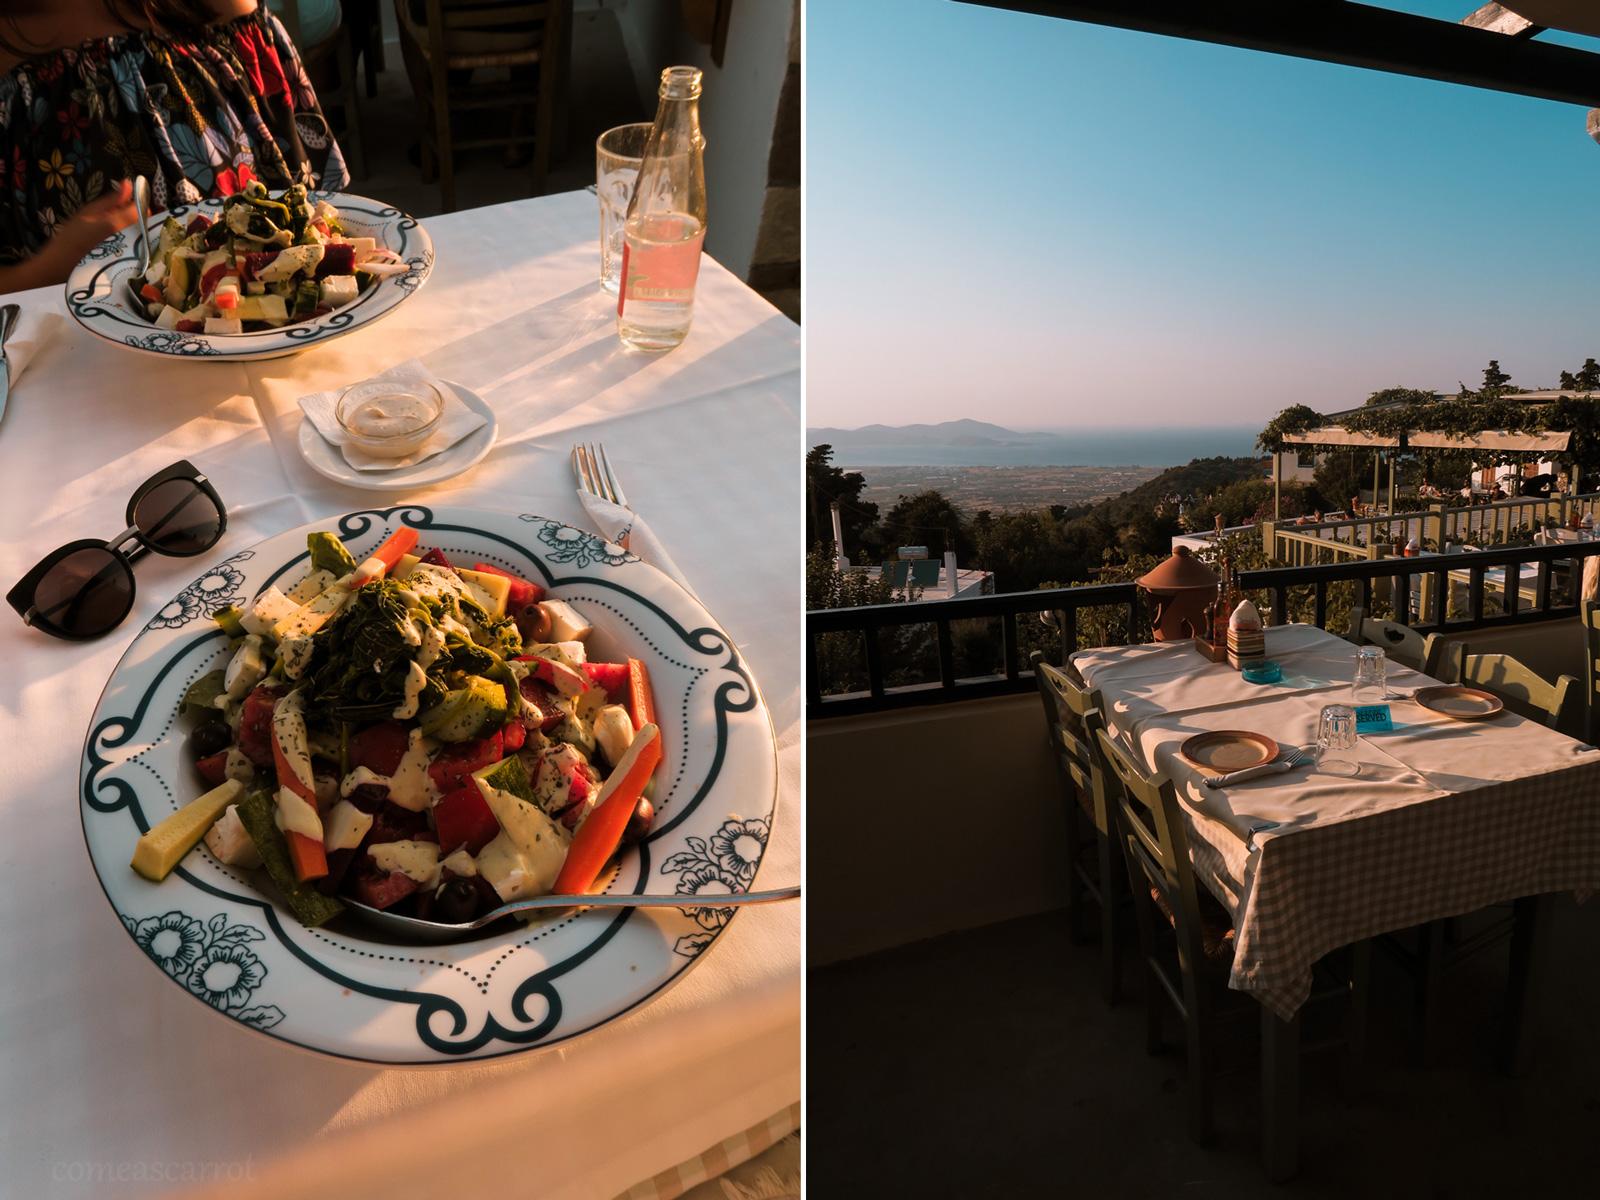 kos_urlaub_reise_tipps_erfahrung_cafes_restaurants_reisebericht_comeascarrot_reise_bloggerin_deutschland_zia_oromedon